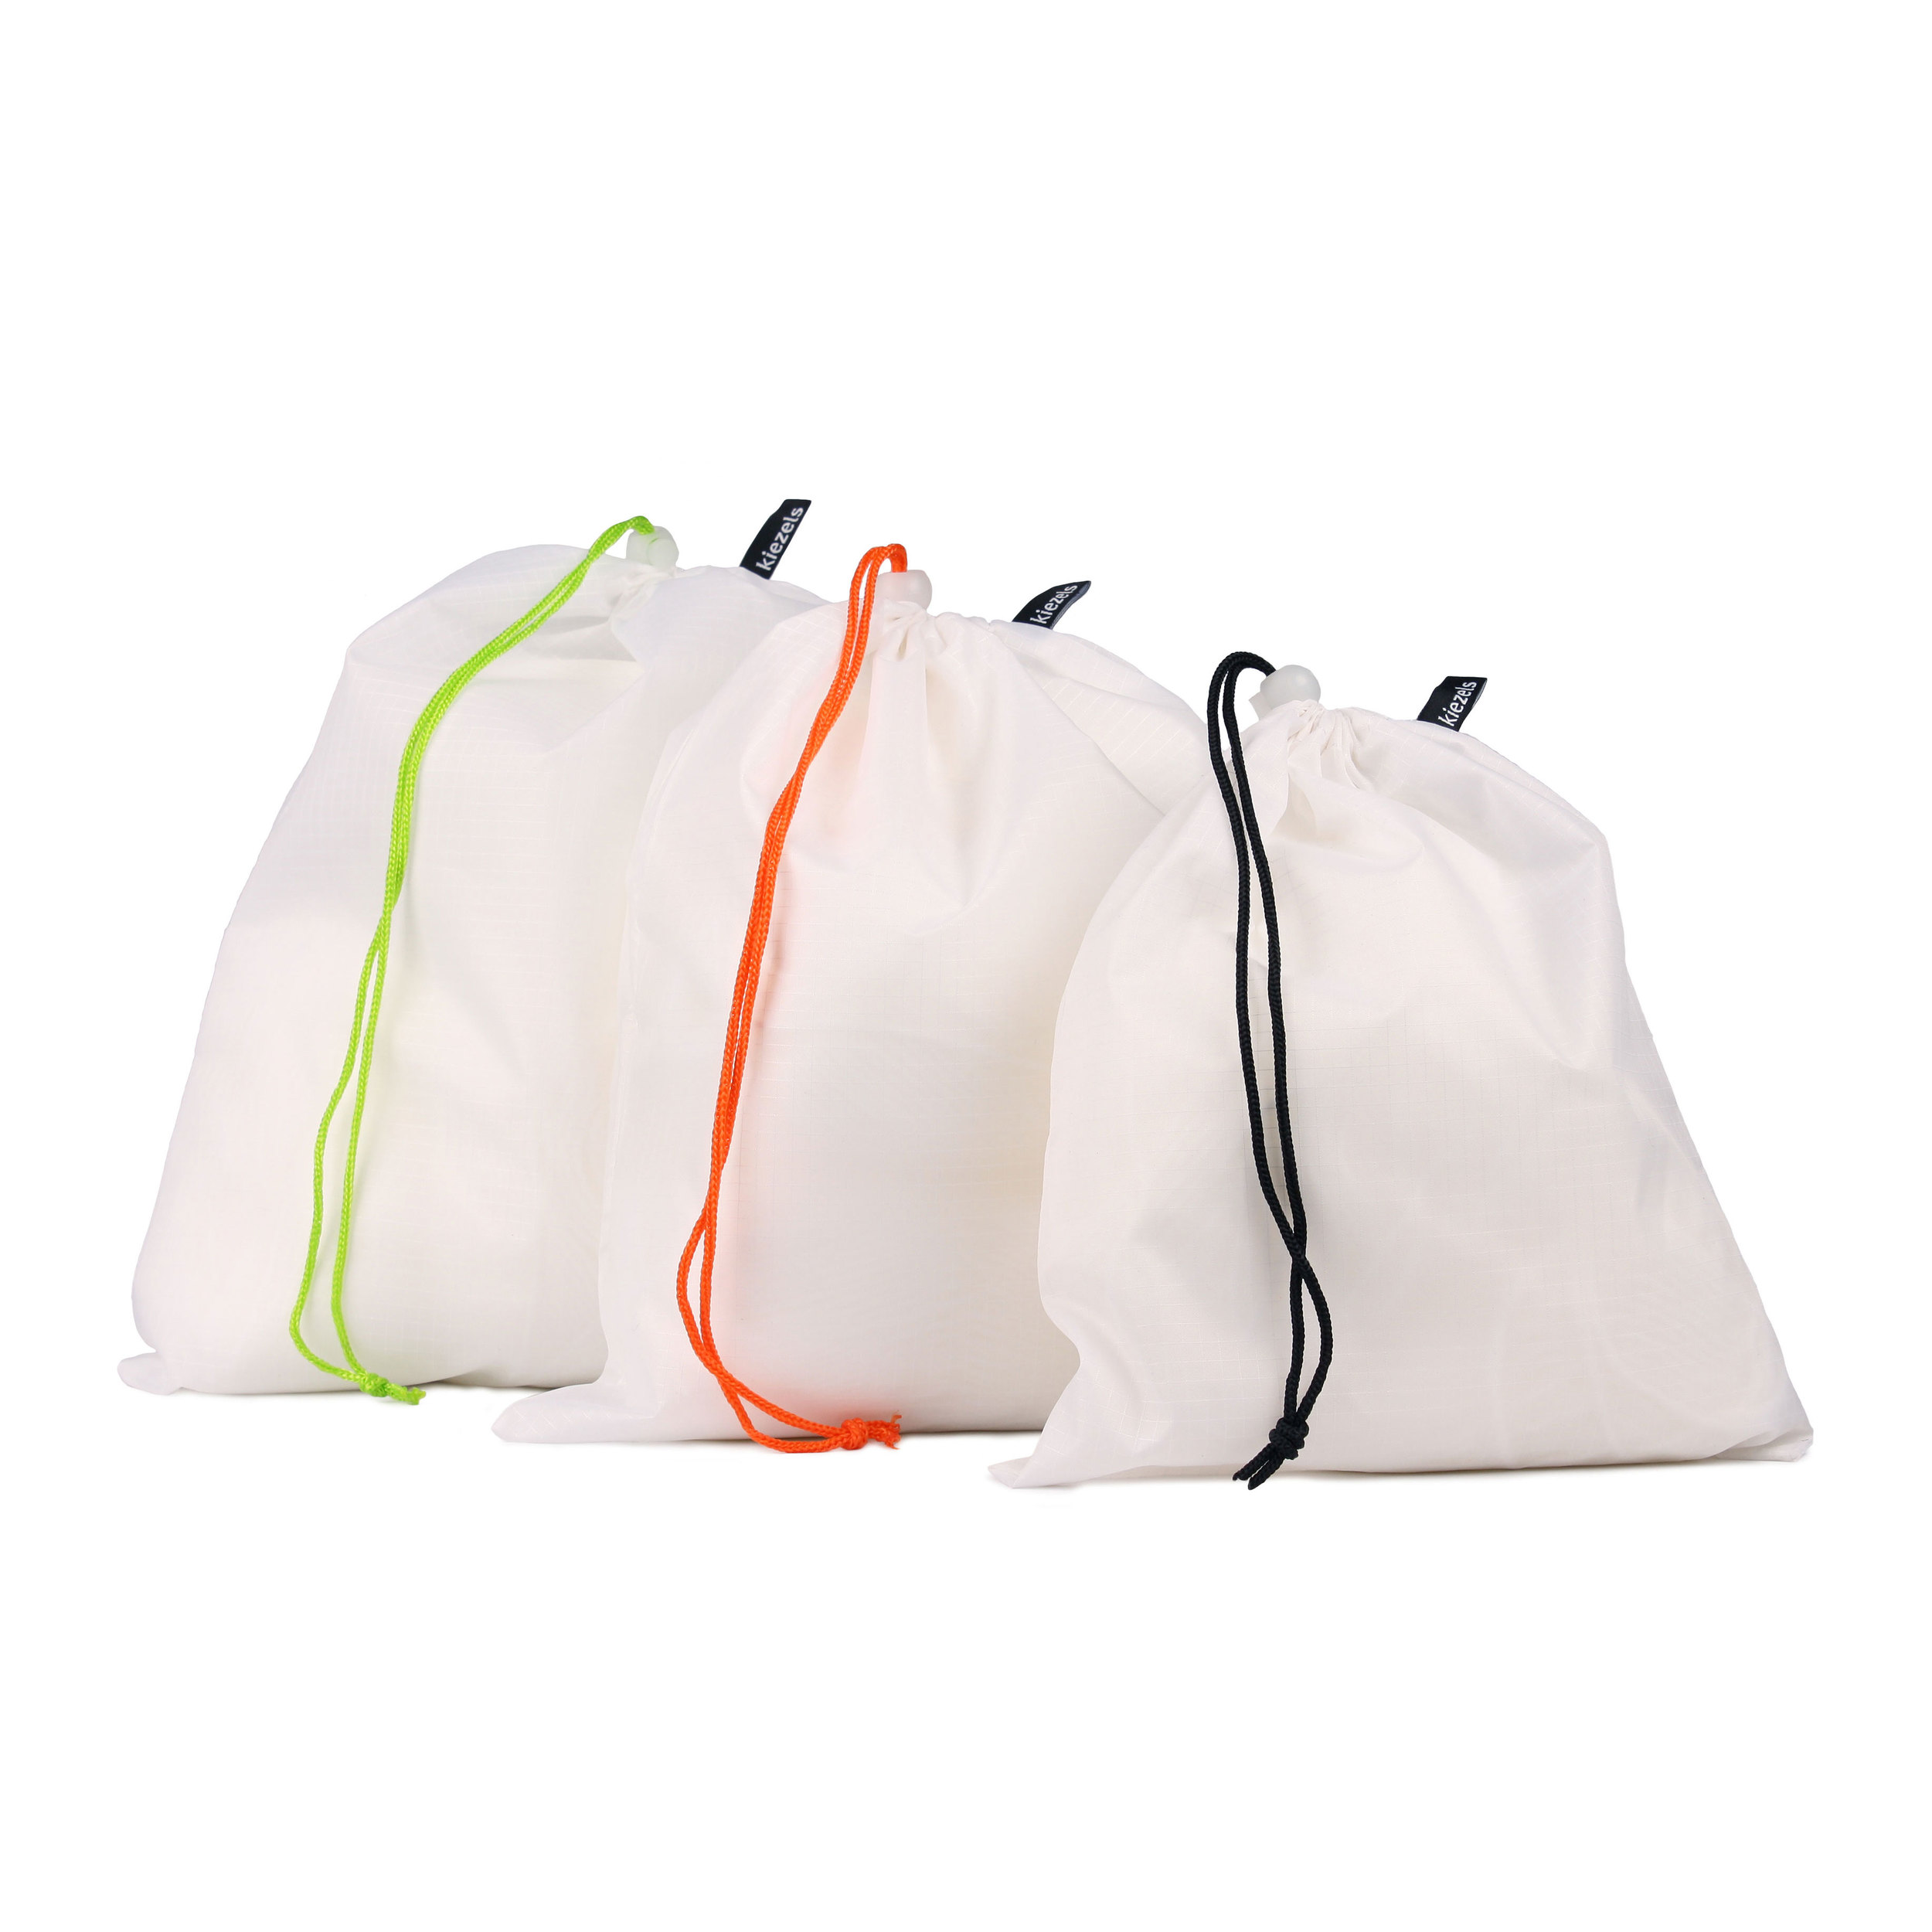 No. 206 Travel organiser bags - 3 sizes - white € 17,50